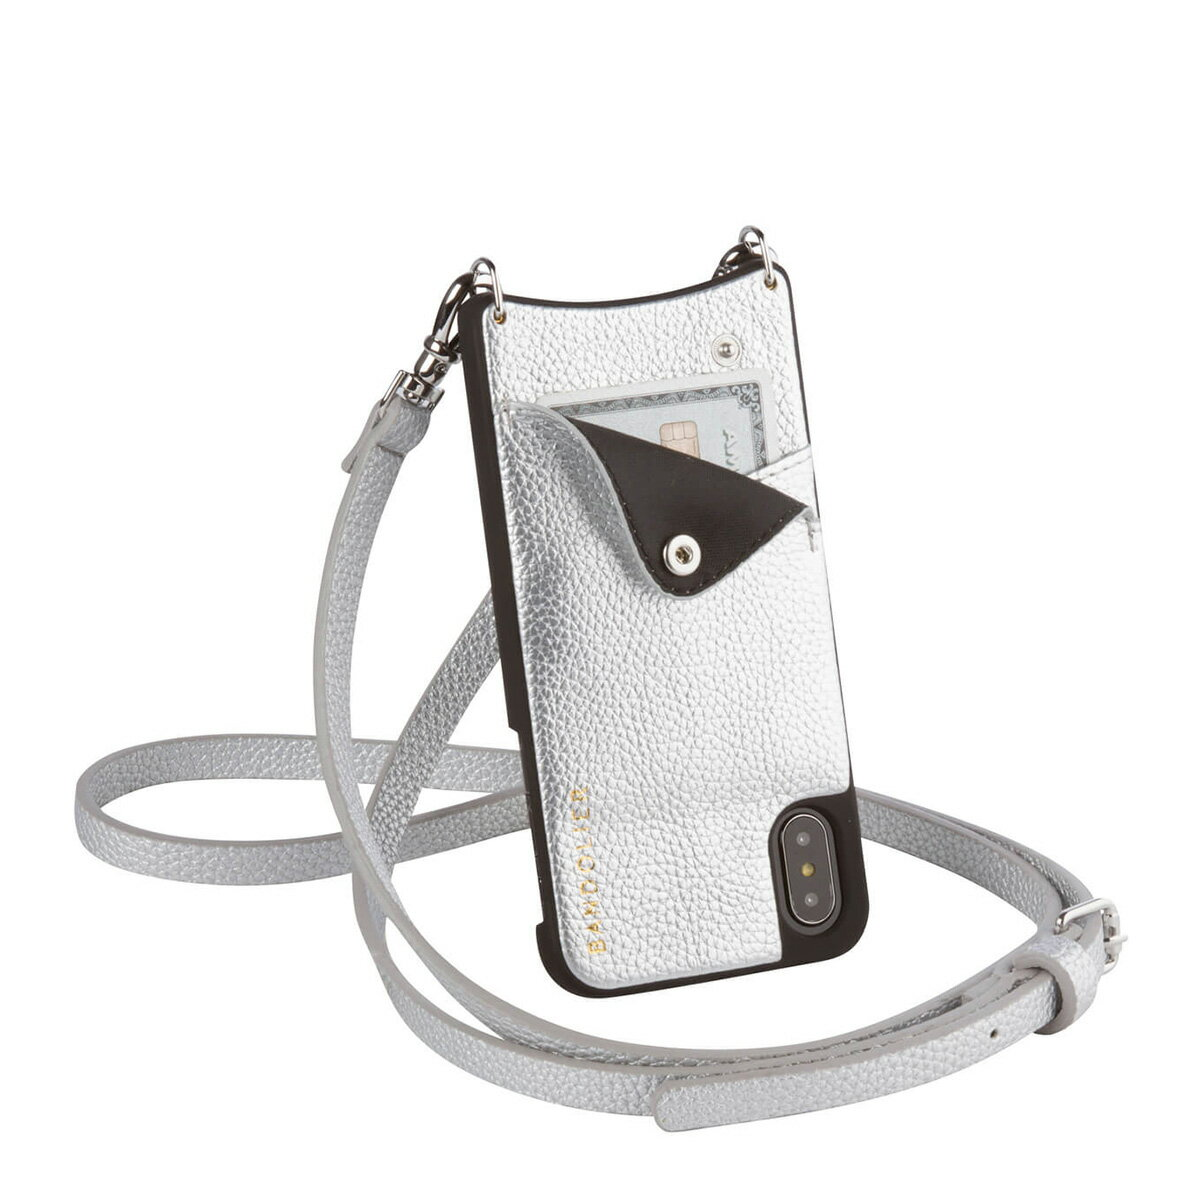 BANDOLIER iPhoneXS X EMMA RICH SILVER バンドリヤー ケース スマホ アイフォン メンズ レディース [193]